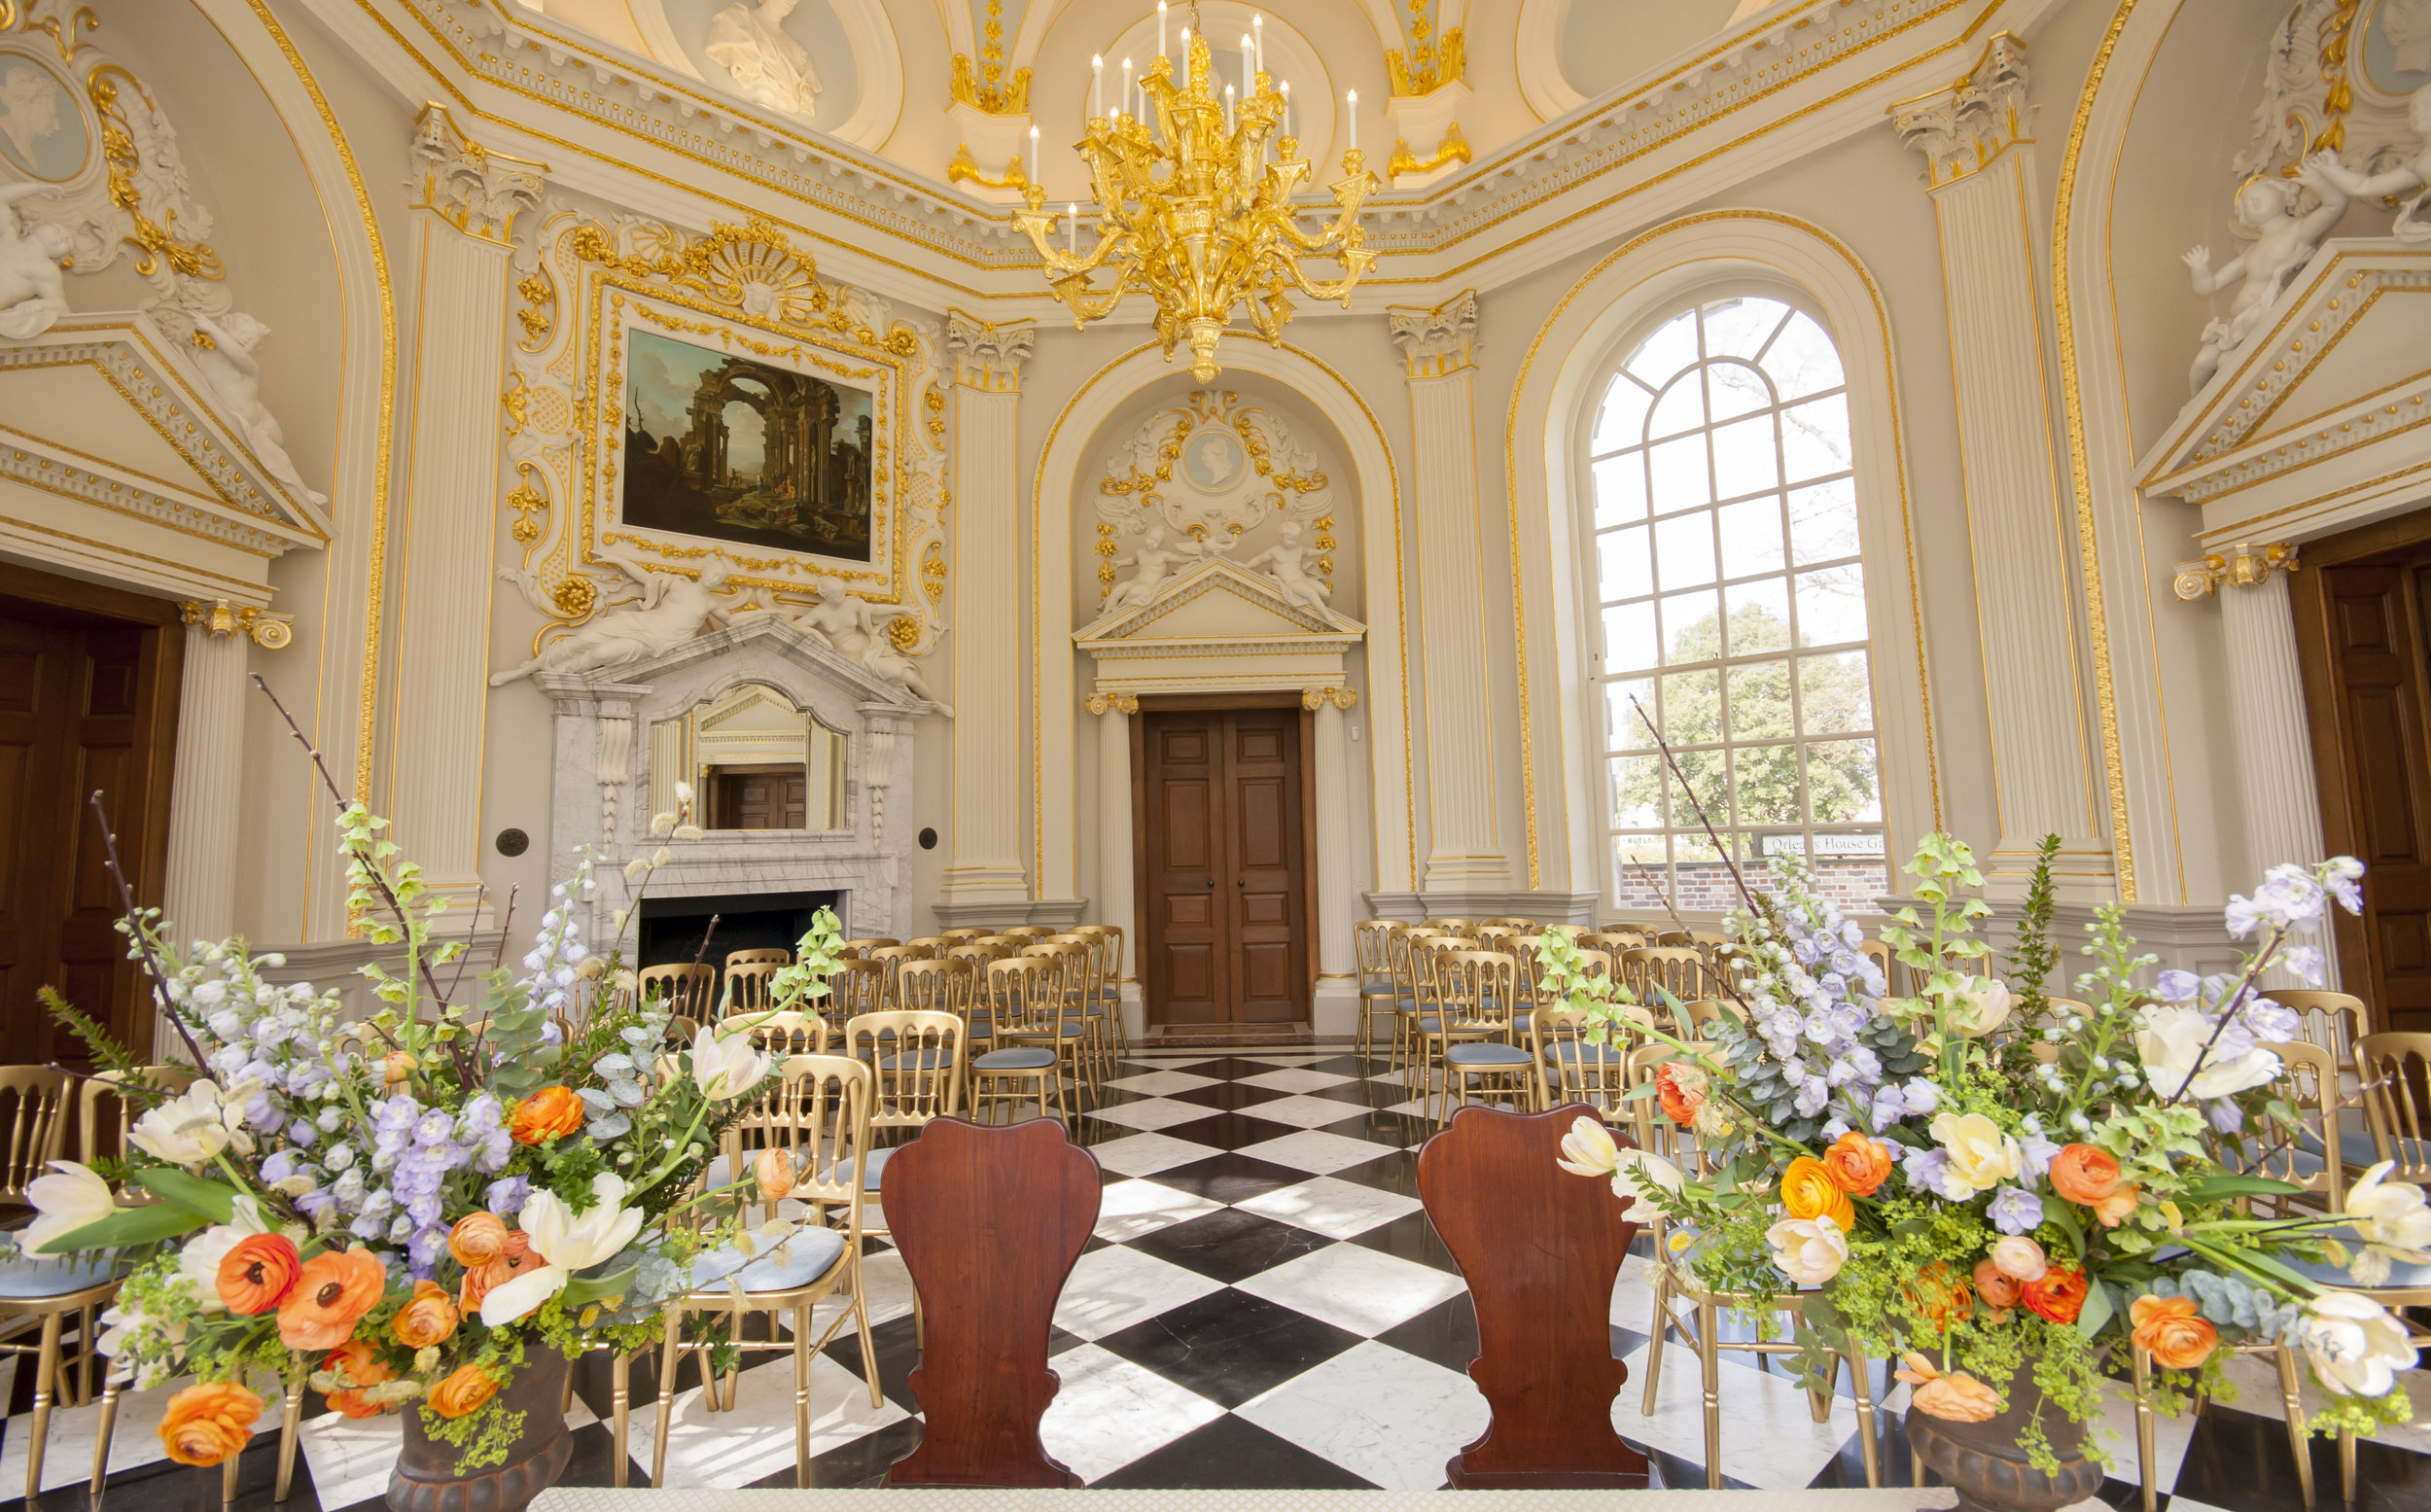 Orleans_House_Twickenham_Wedding_flowers3.jpg